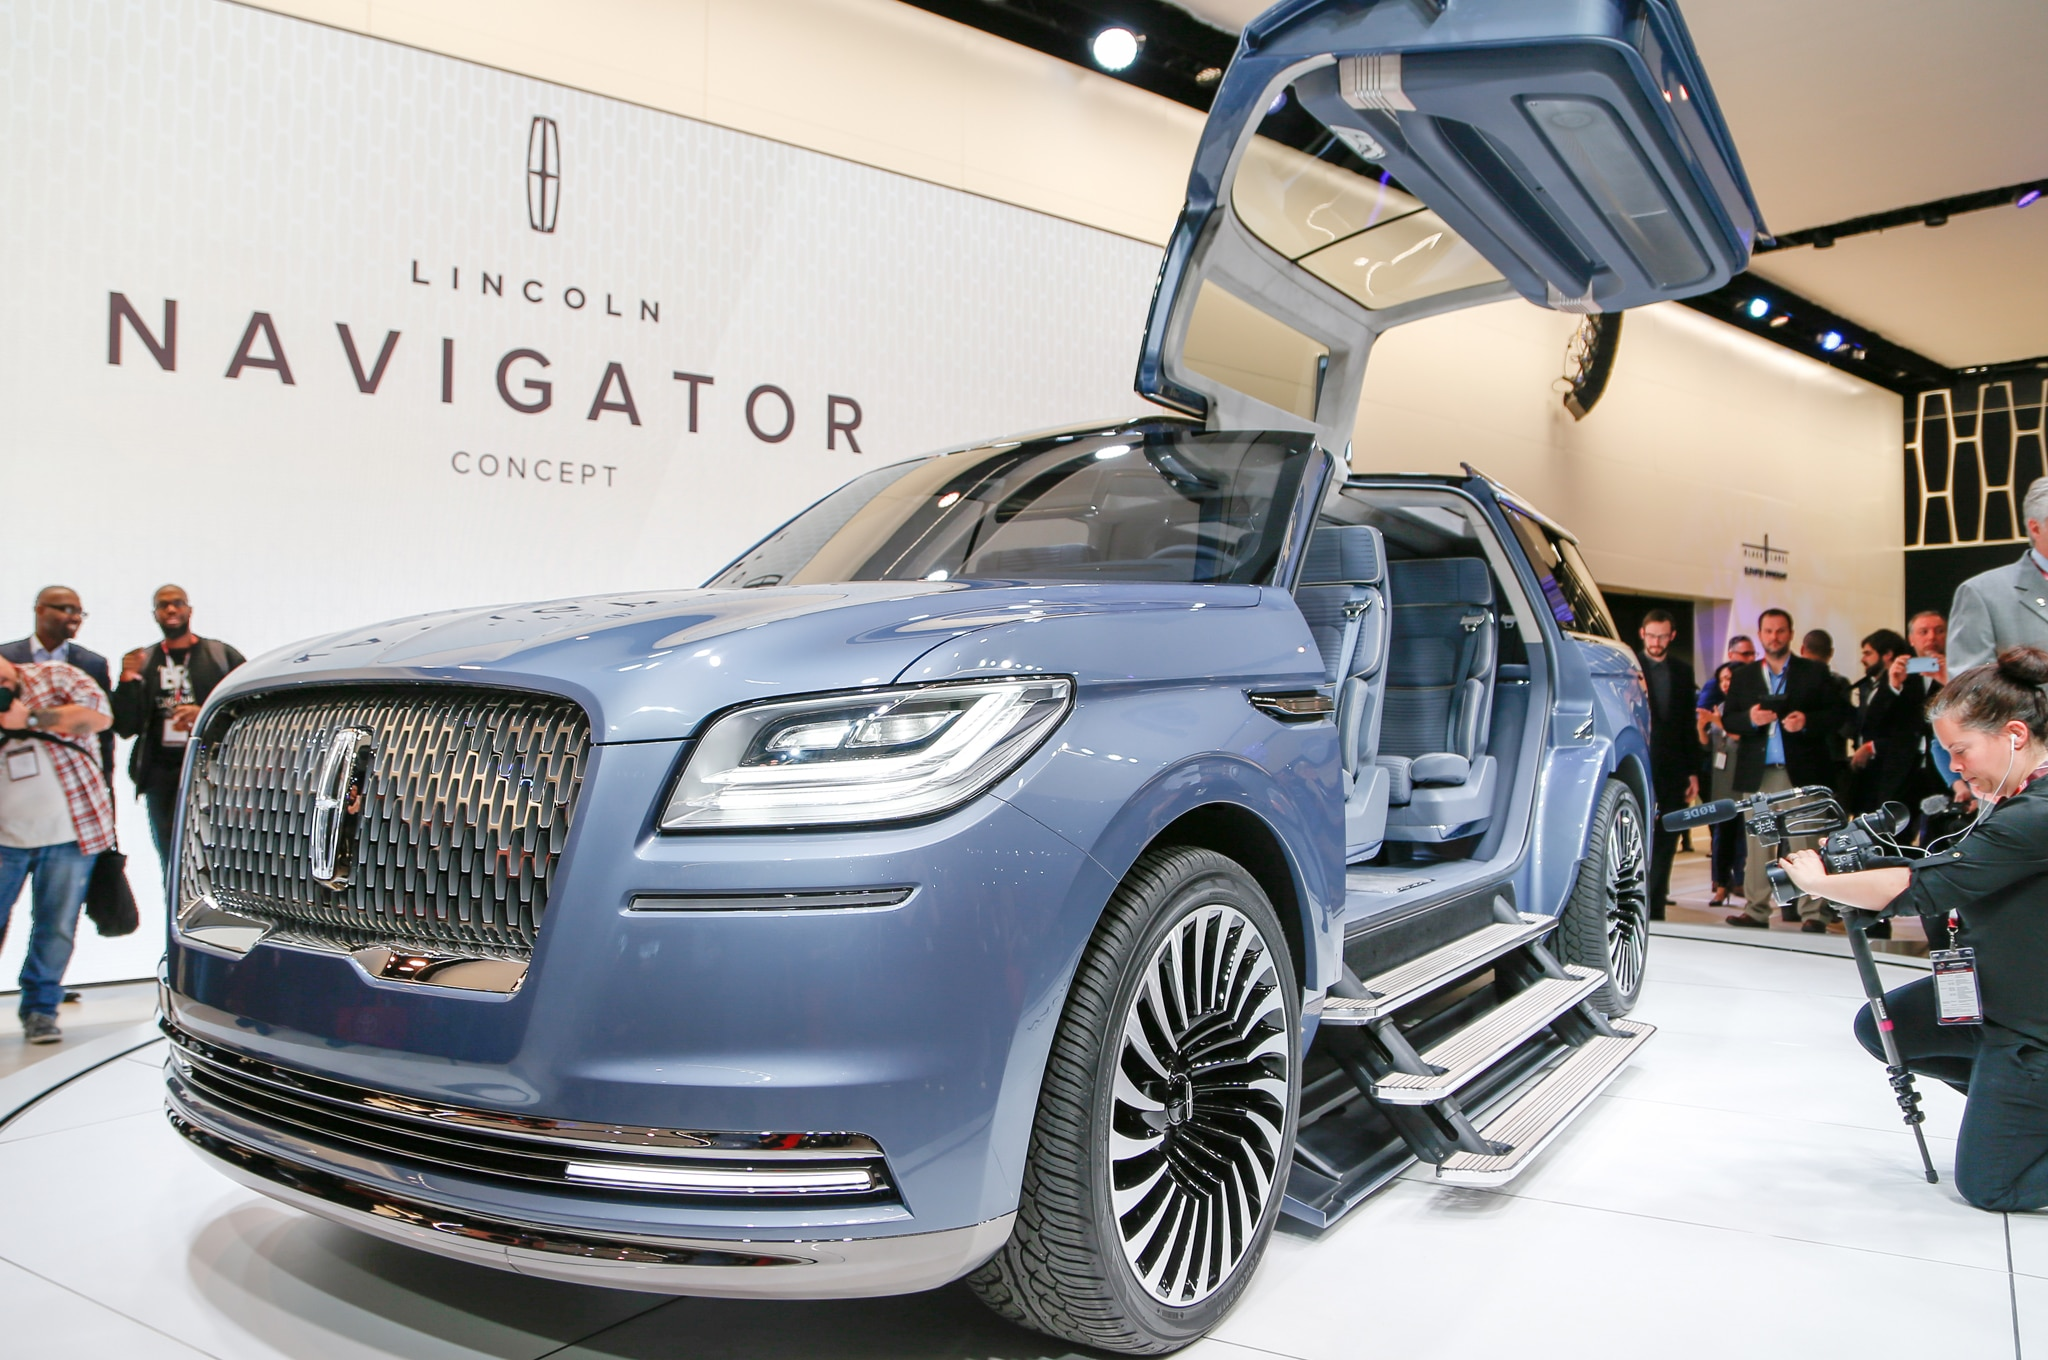 http://st.automobilemag.com/uploads/sites/11/2016/03/Lincoln-Navigator-concept-on-show-floor-front-side-view-door-open.jpg